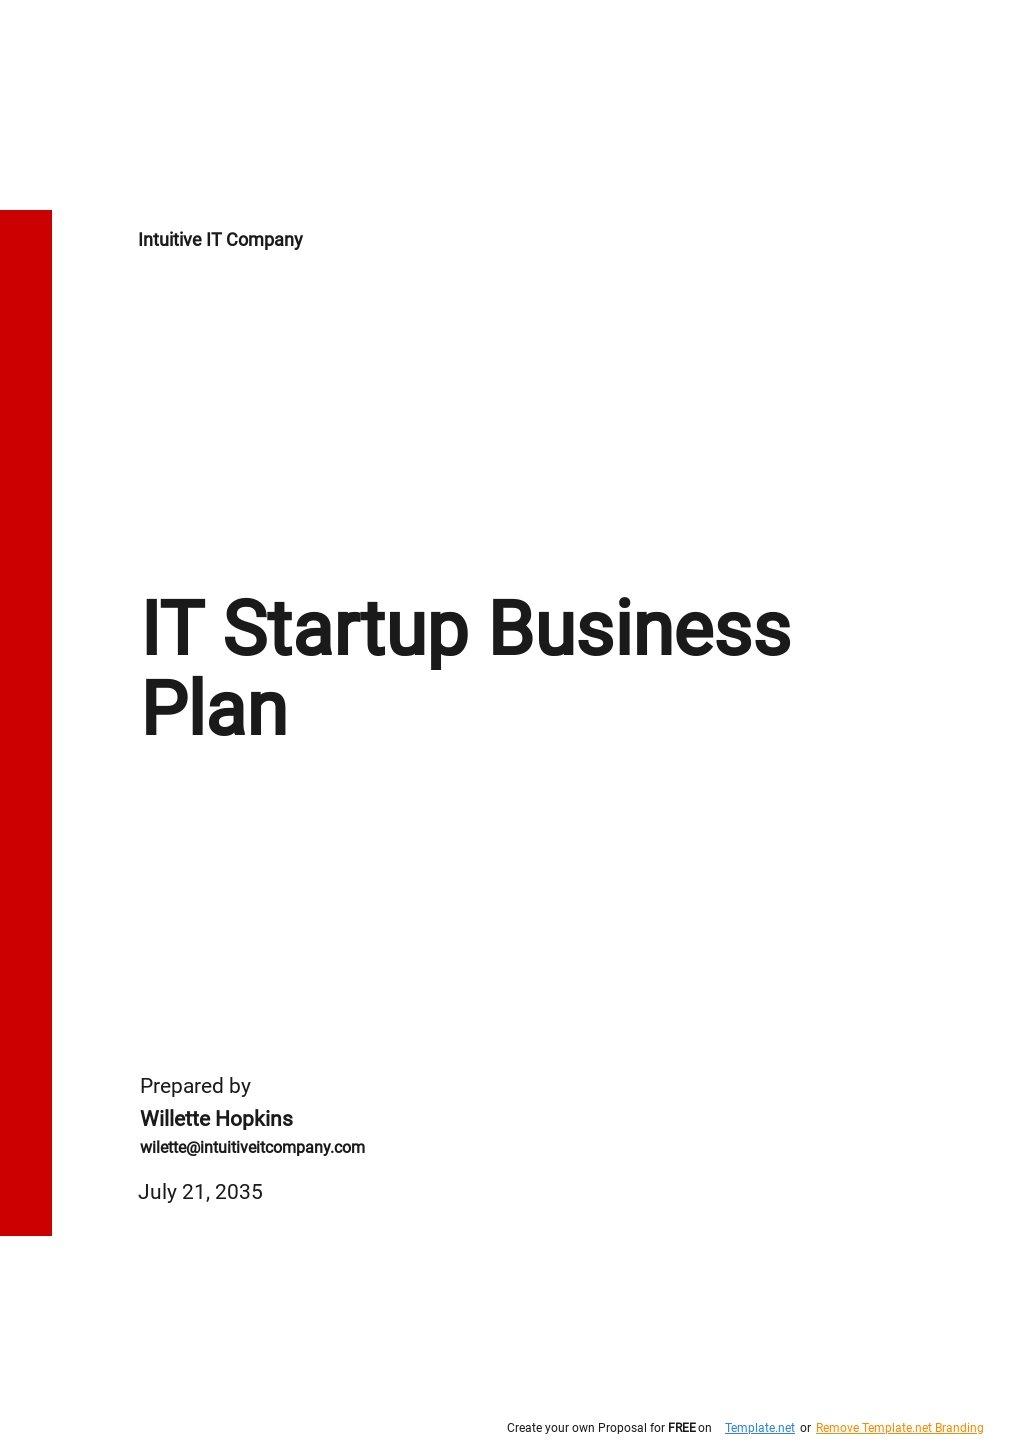 IT Startup Business Plan Template.jpe